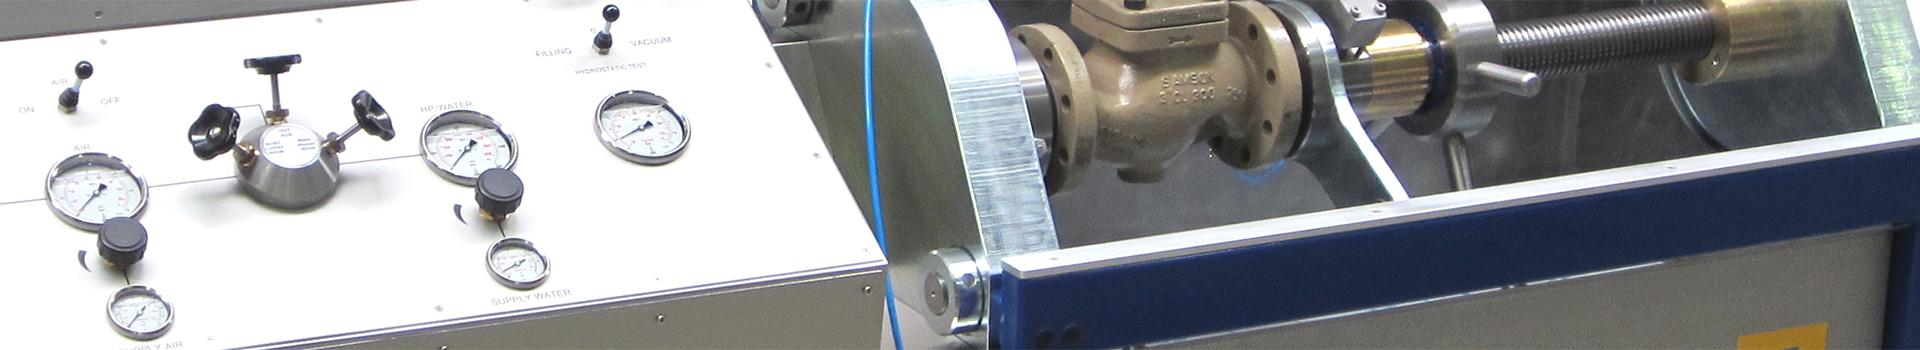 csv-50-200-slide